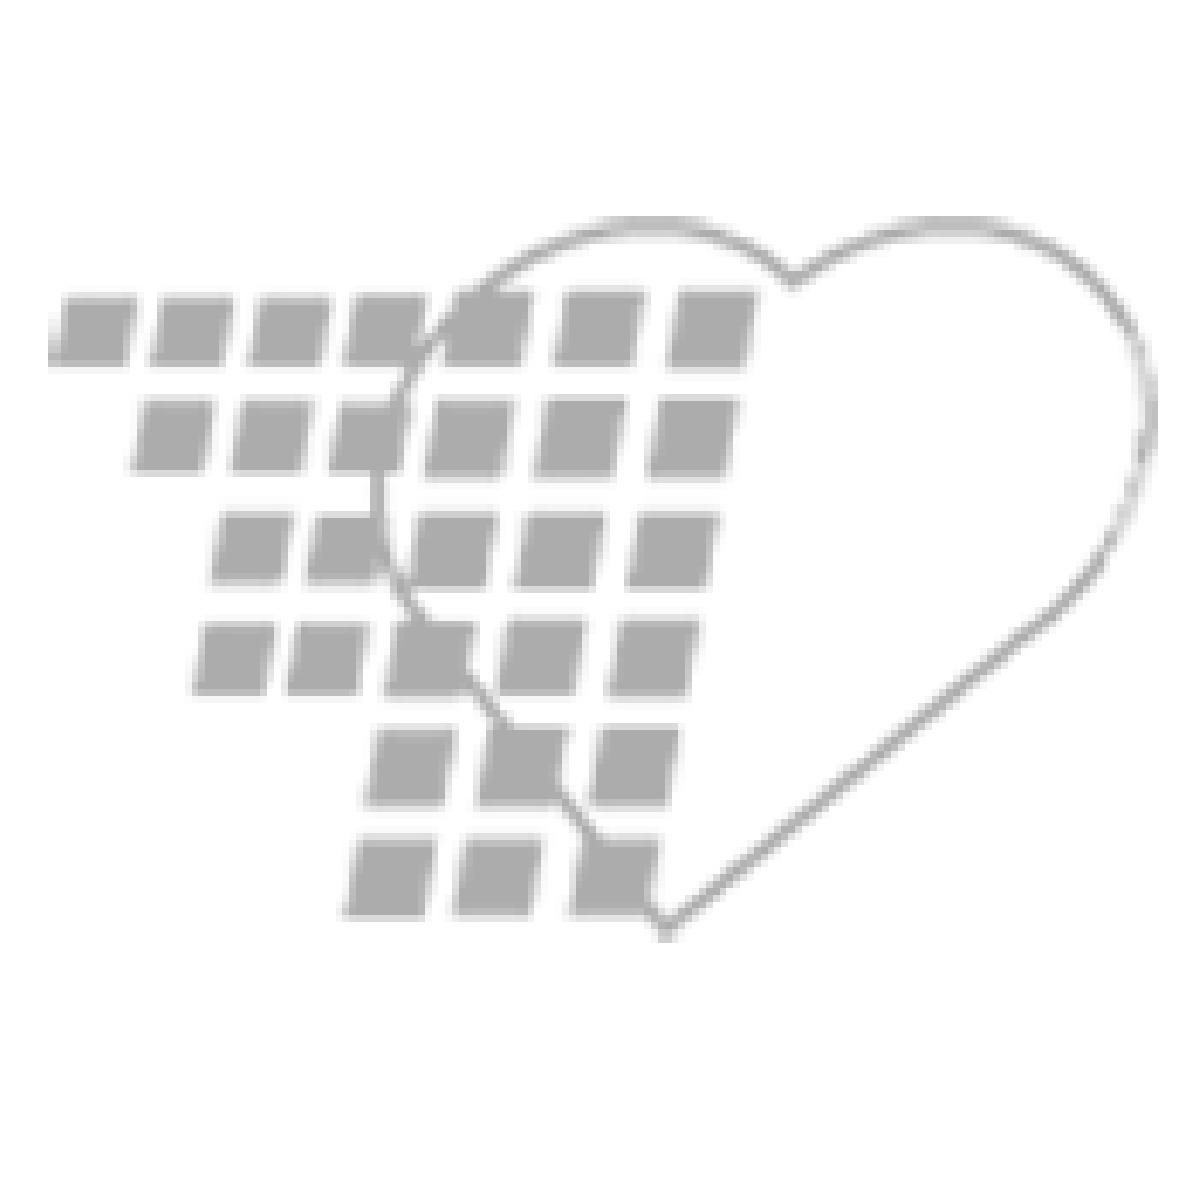 02-43-1212-REFURB Refurbished LIFEPAK® 12 Defibrilllator - 12 Lead